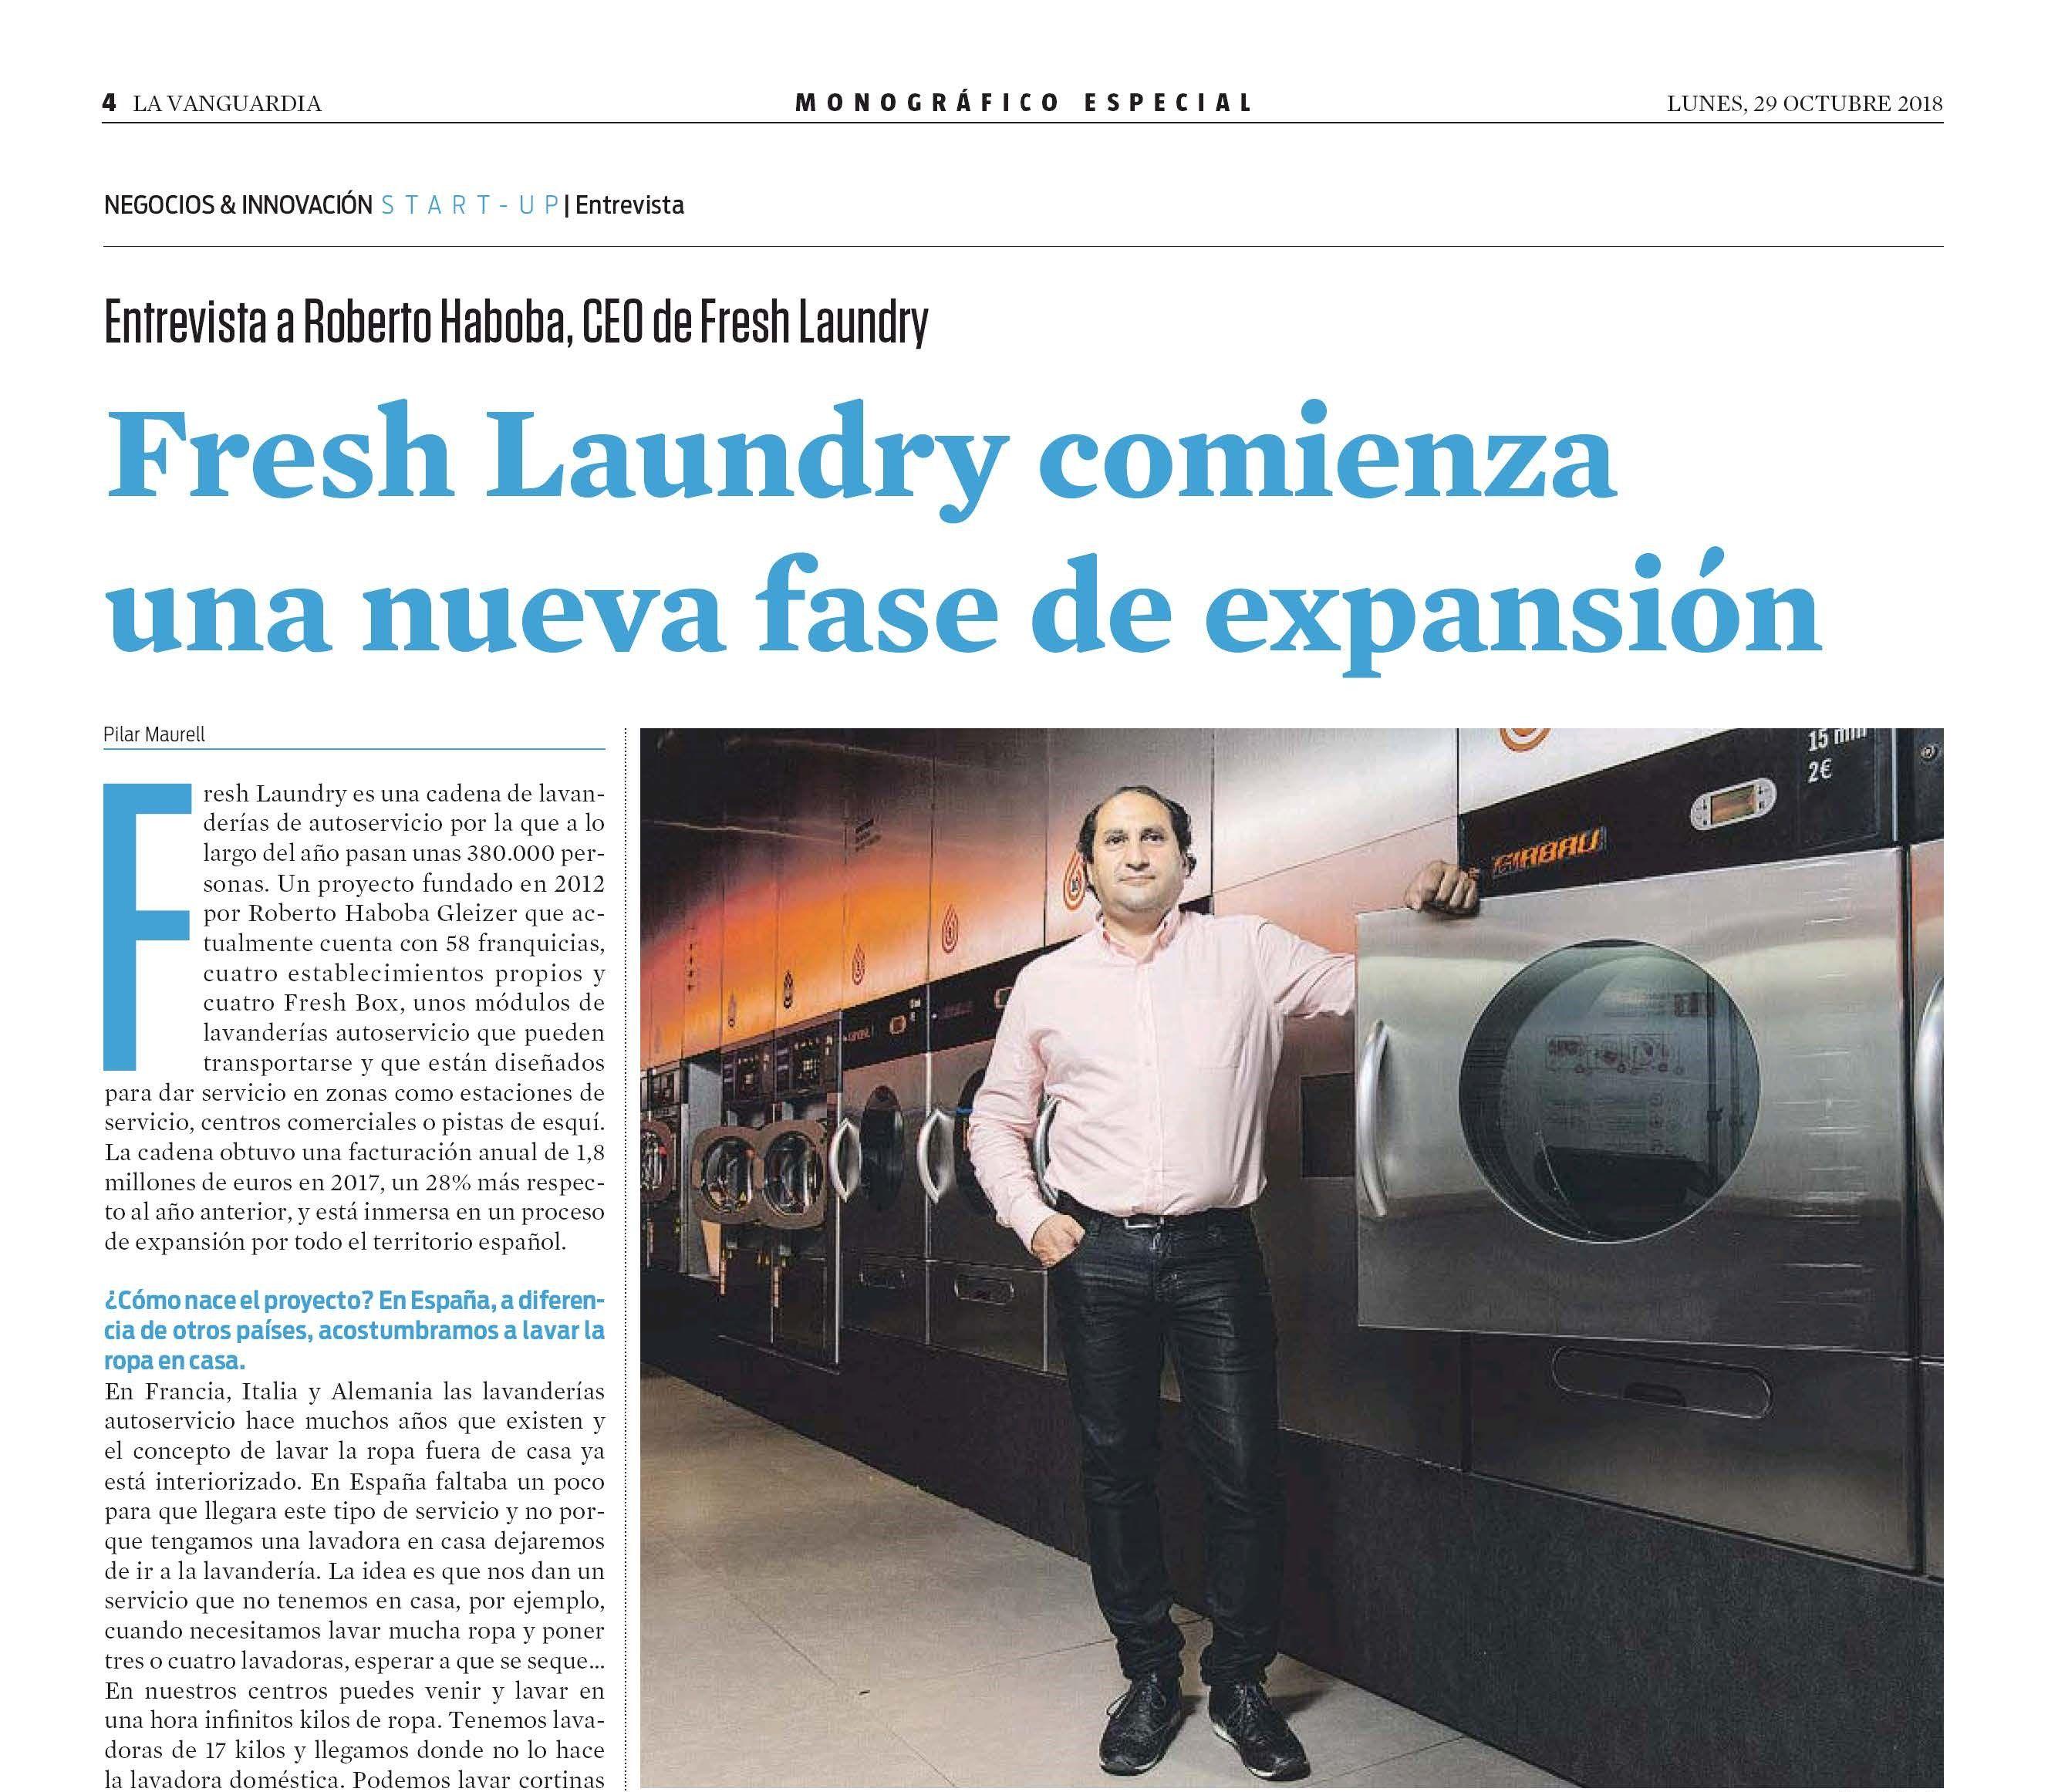 https://whiterabbit.es/wp-content/uploads/2018/10/whiterabbit-freshlaundry2.jpg